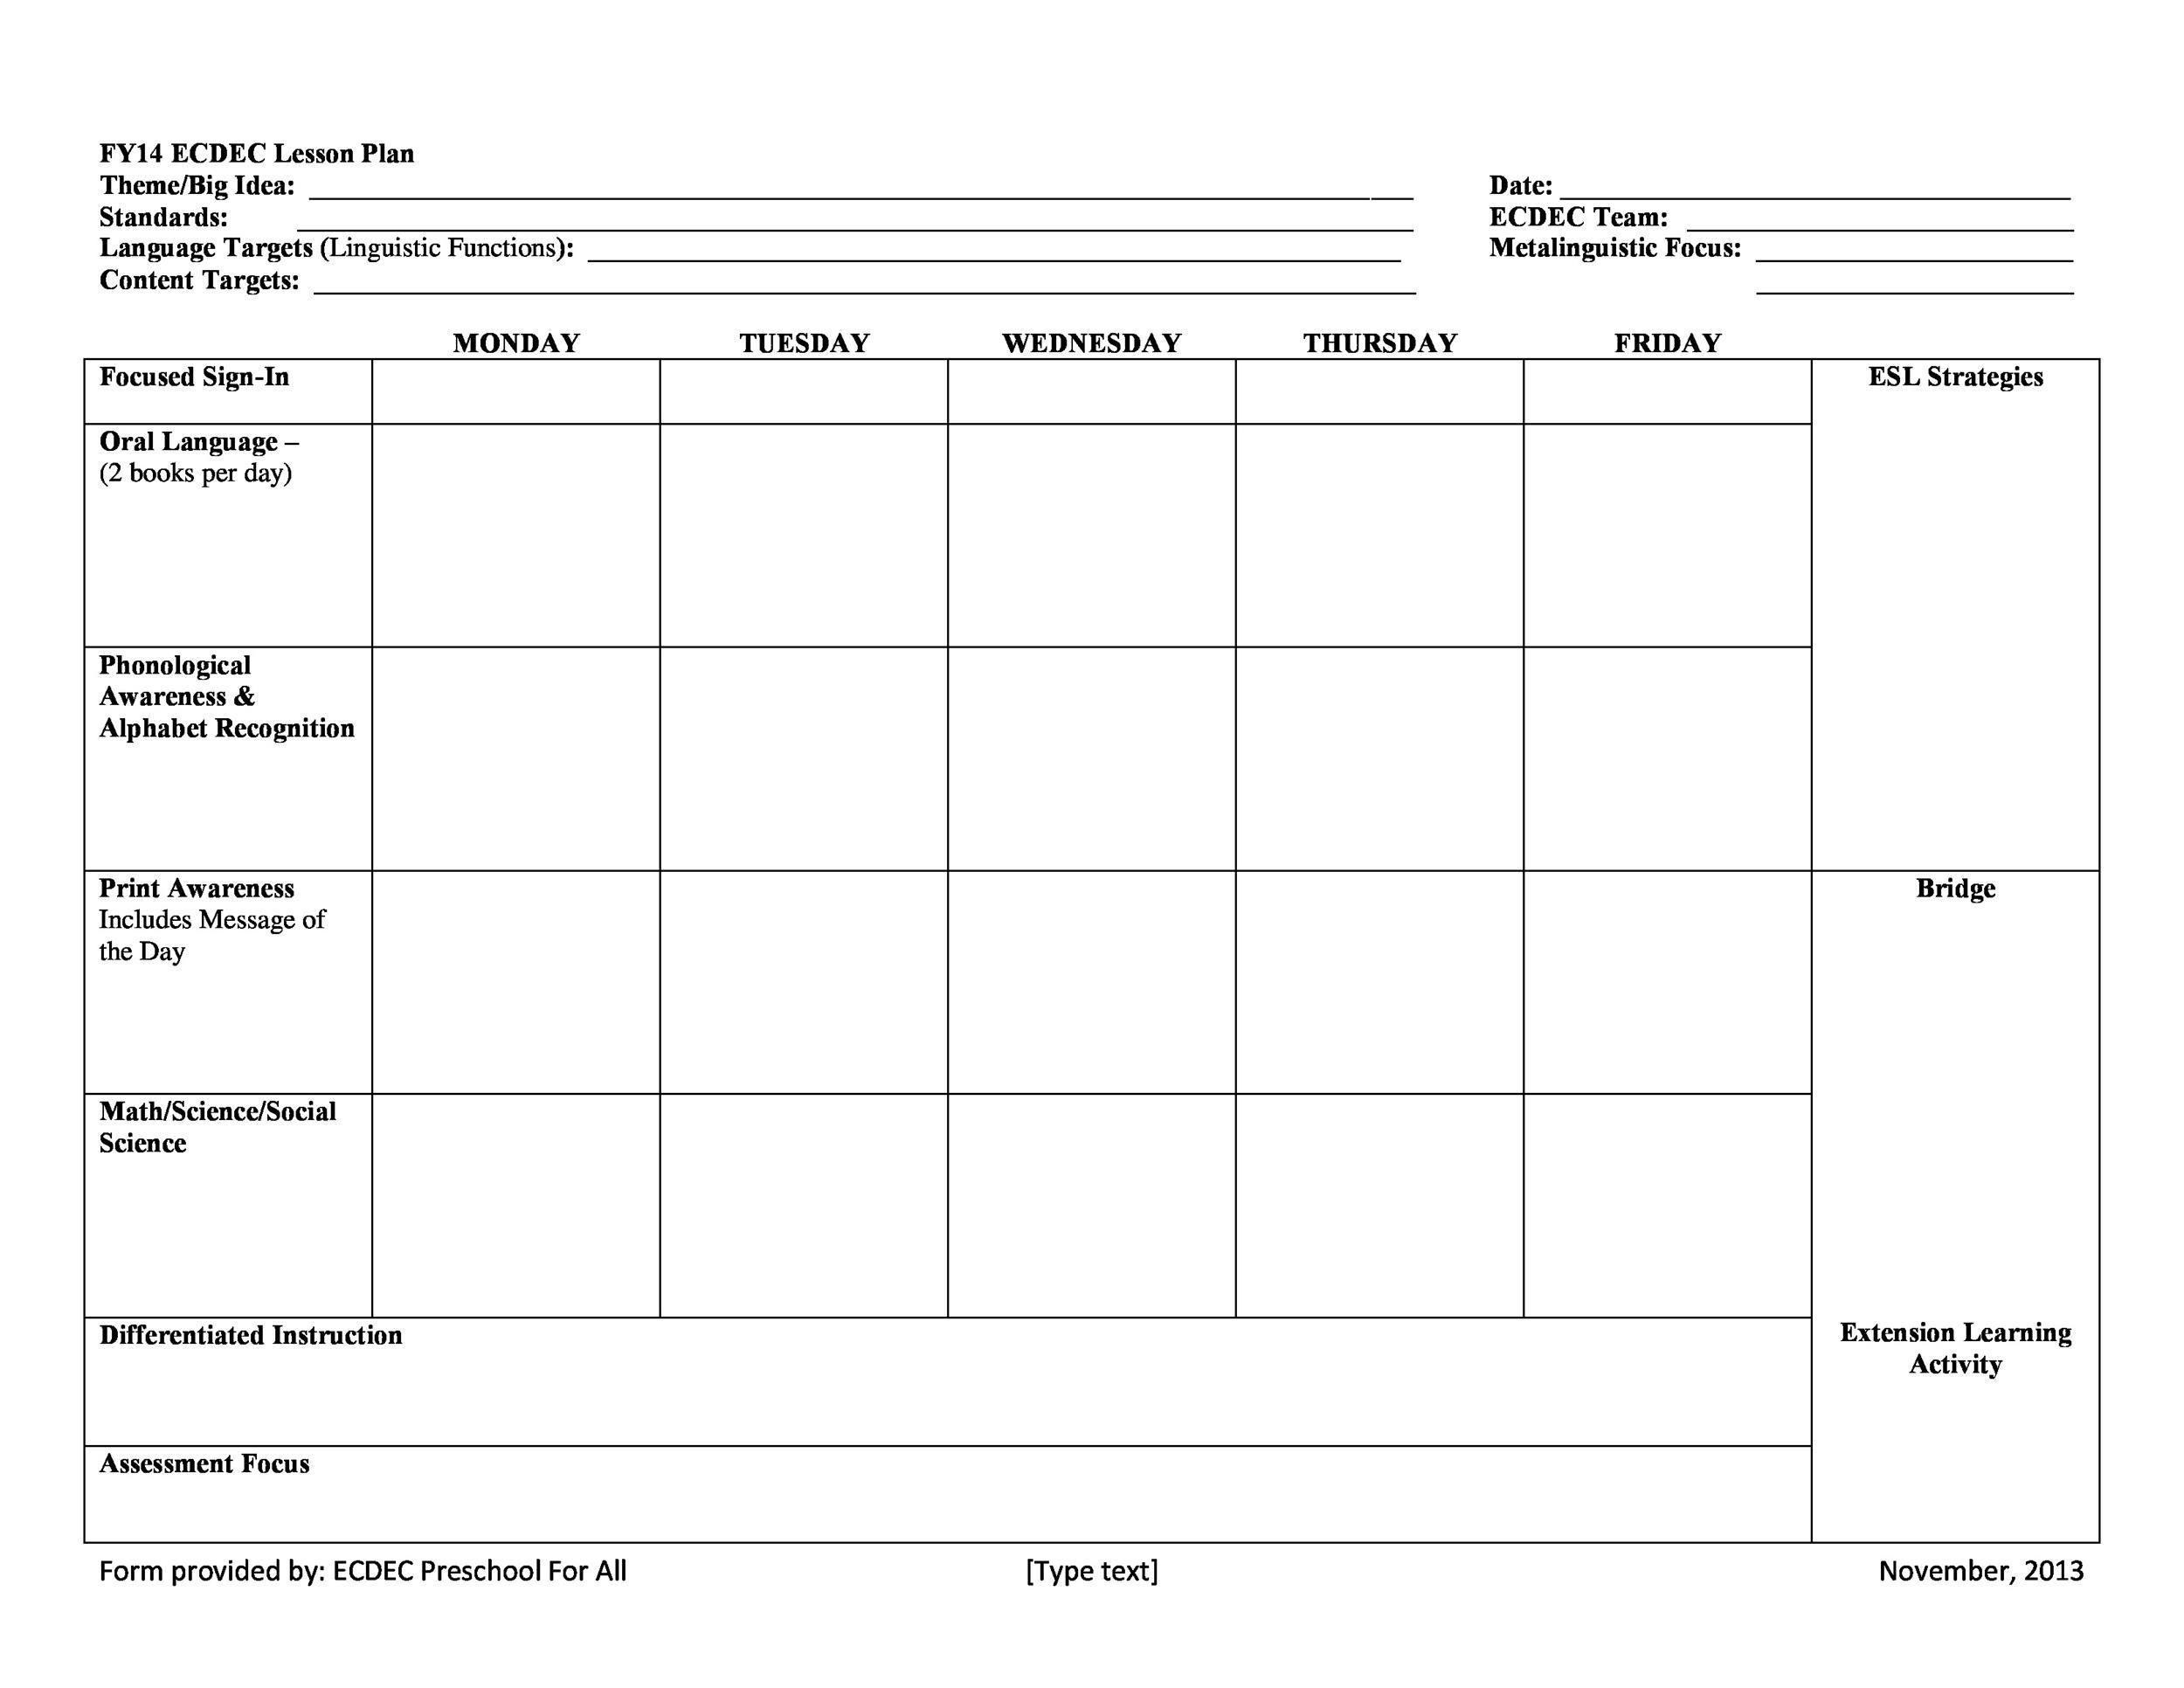 005 Marvelou Blank Weekly Lesson Plan Template Sample  Printable Pdf Free EditableFull